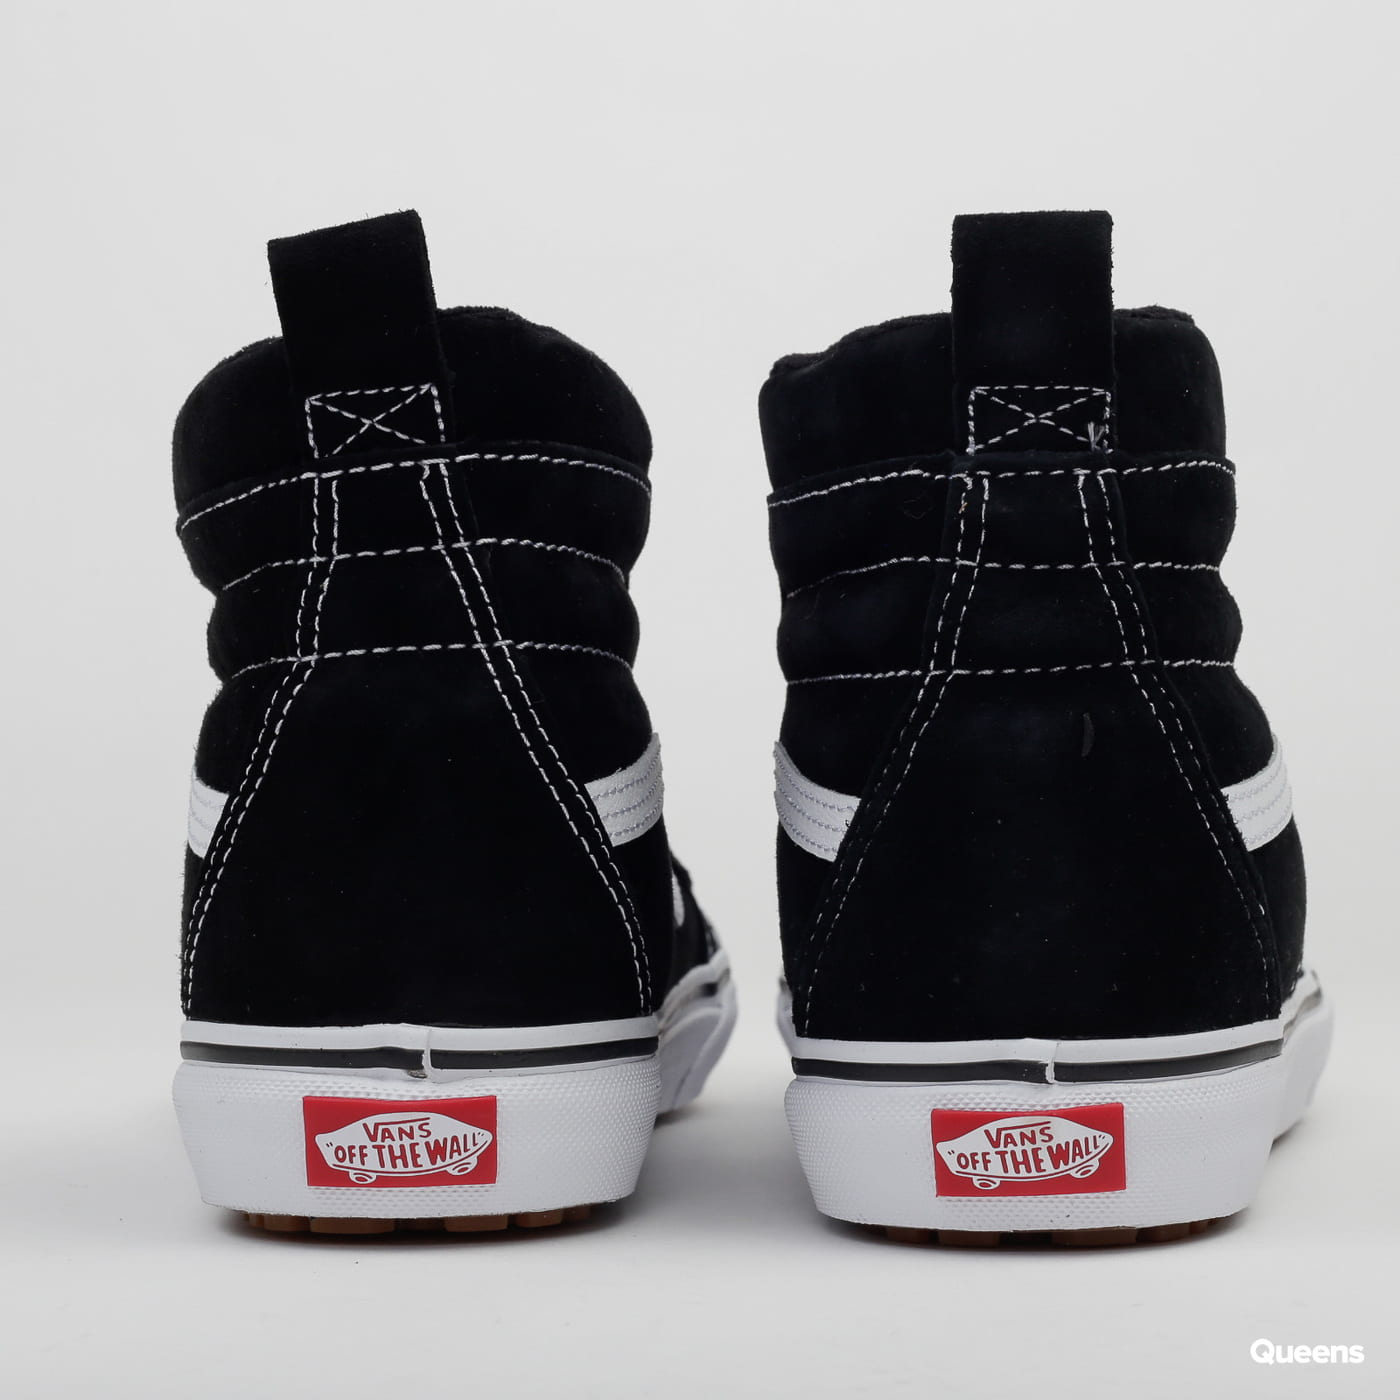 Vans SK8-Hi Mte (mte) black / true white